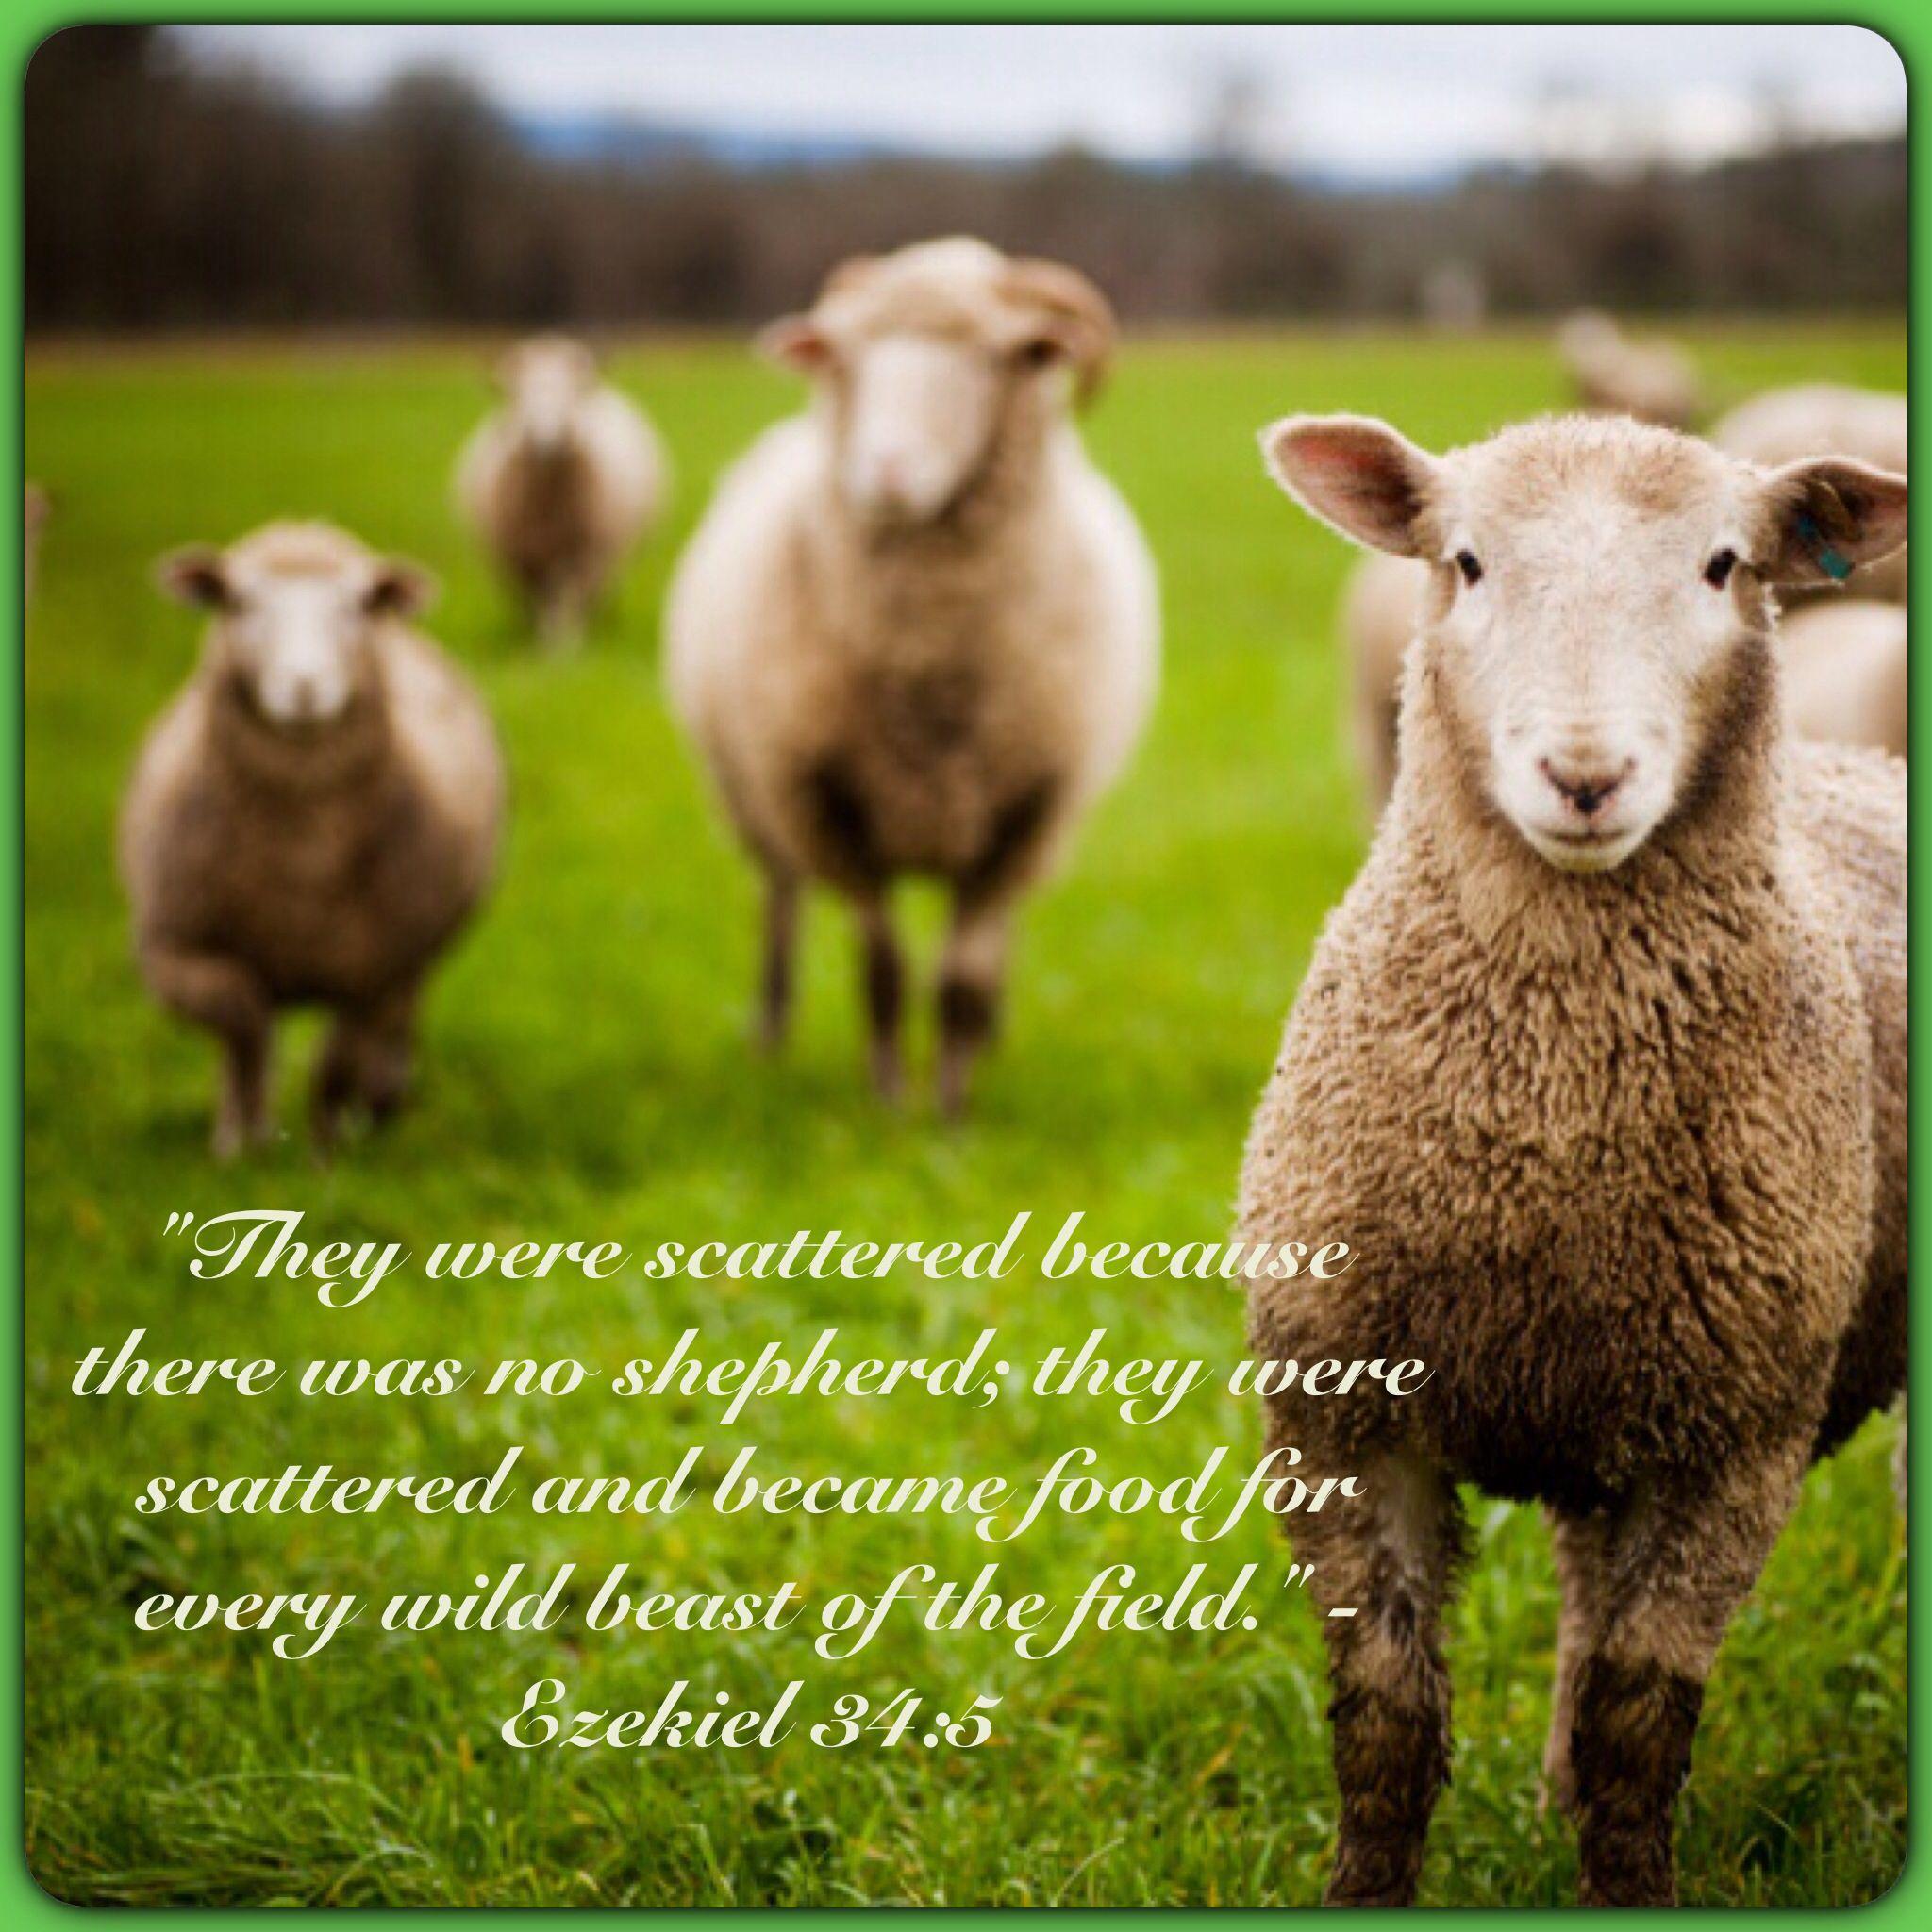 The Bible often describe sheep as responsive, unaggressive